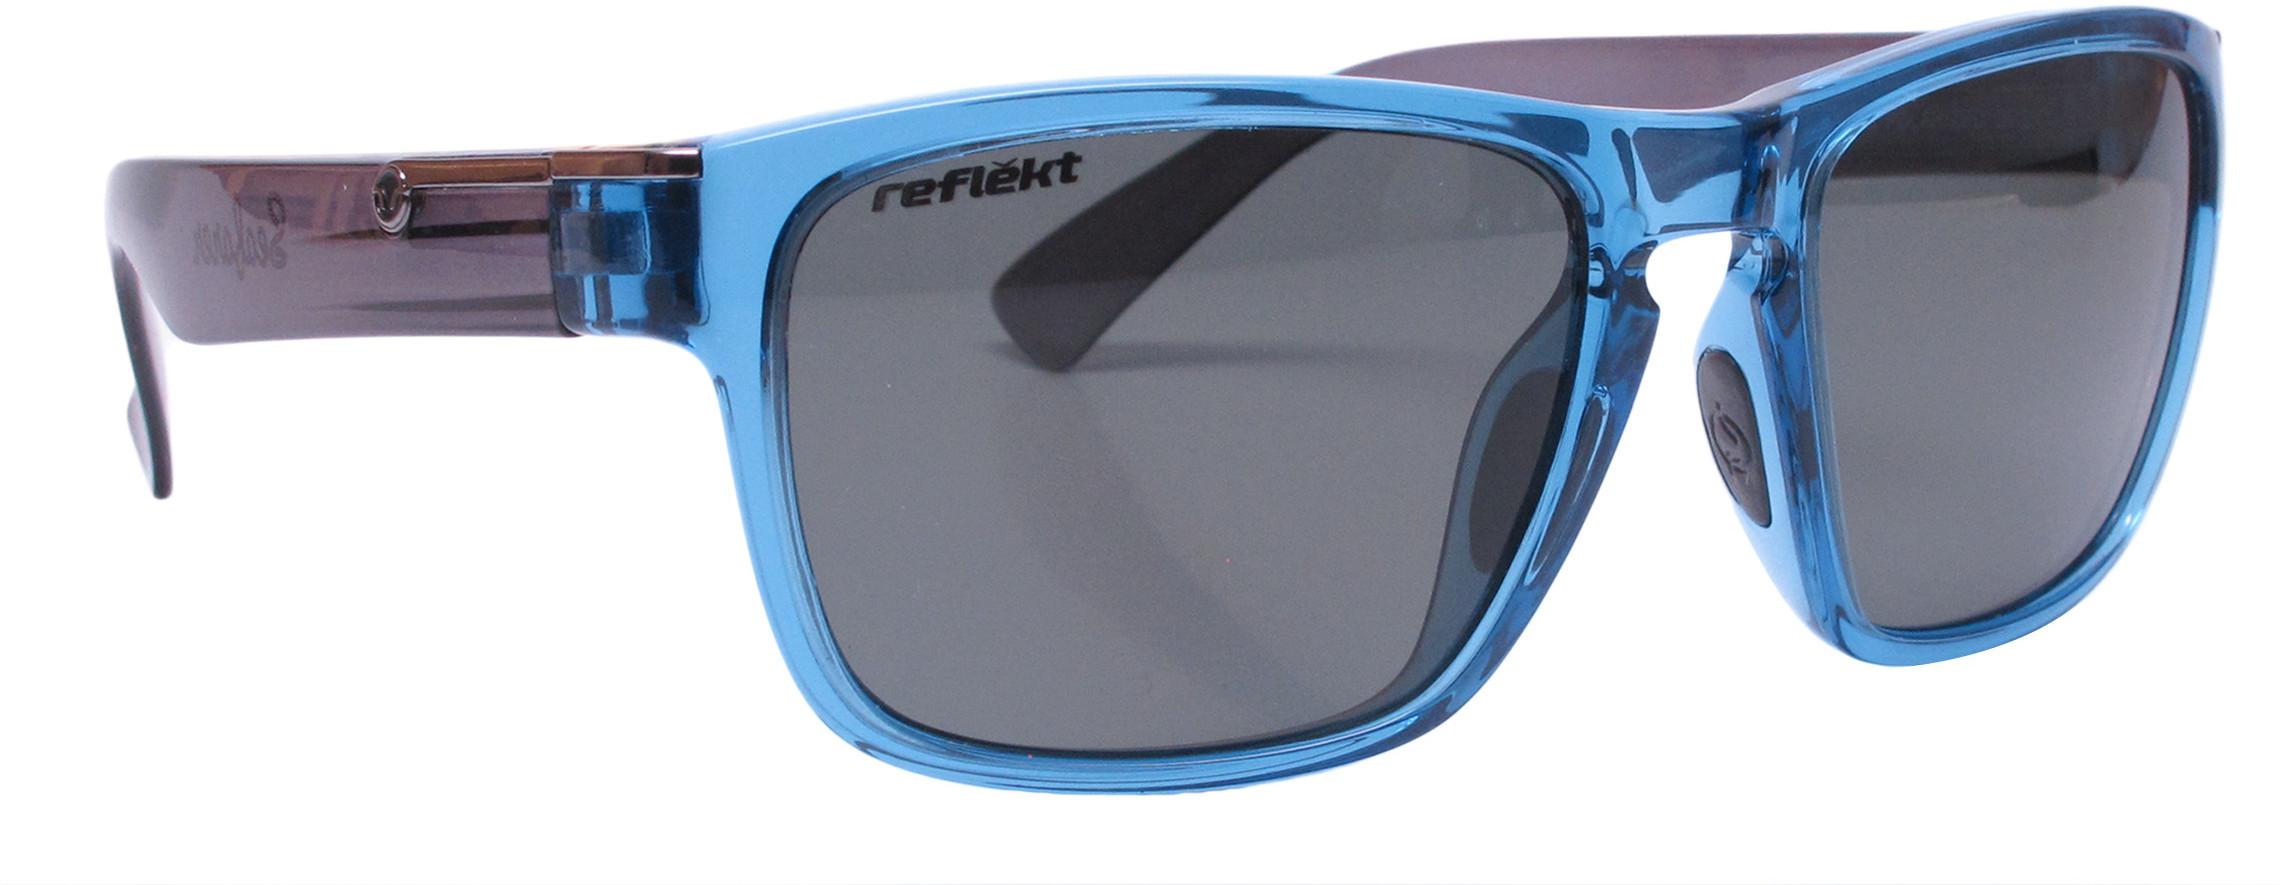 4b3972f1b5 Unsinkable Seafarer Sunglasses FREE S H 106316502